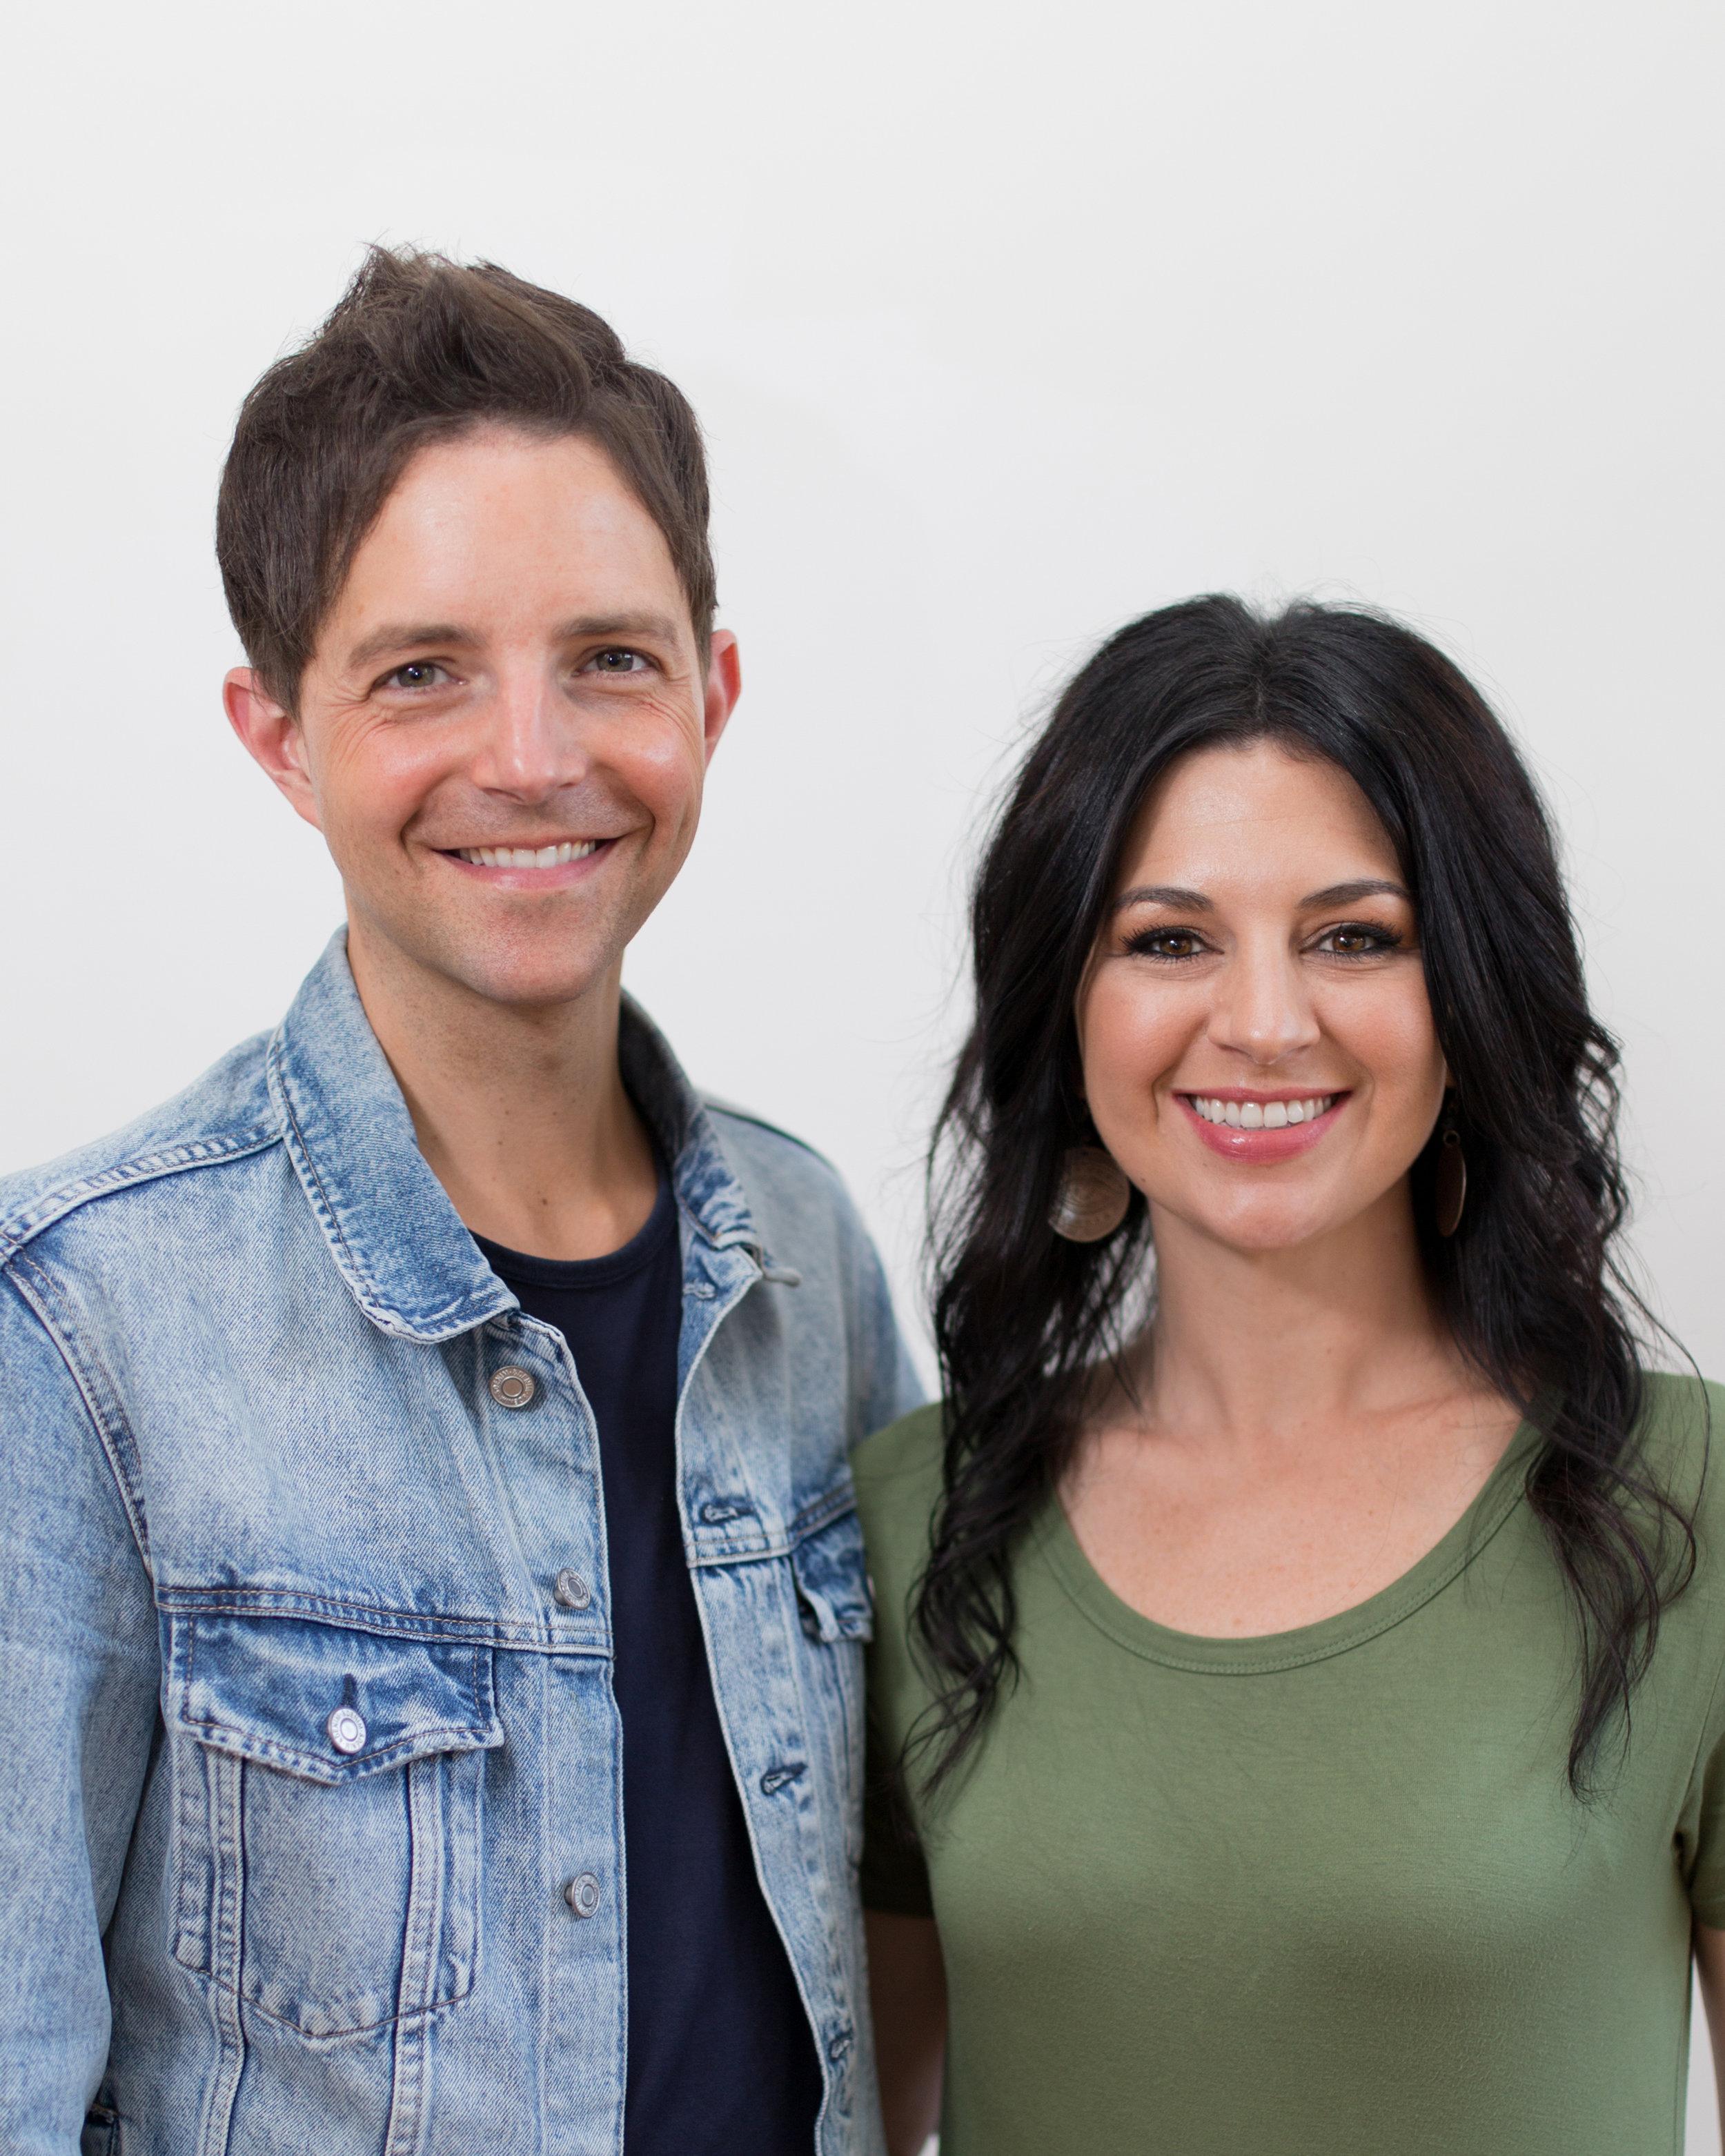 Aaron & Andrea Bennett - LEAD PASTOR | KIDS MINISTRY